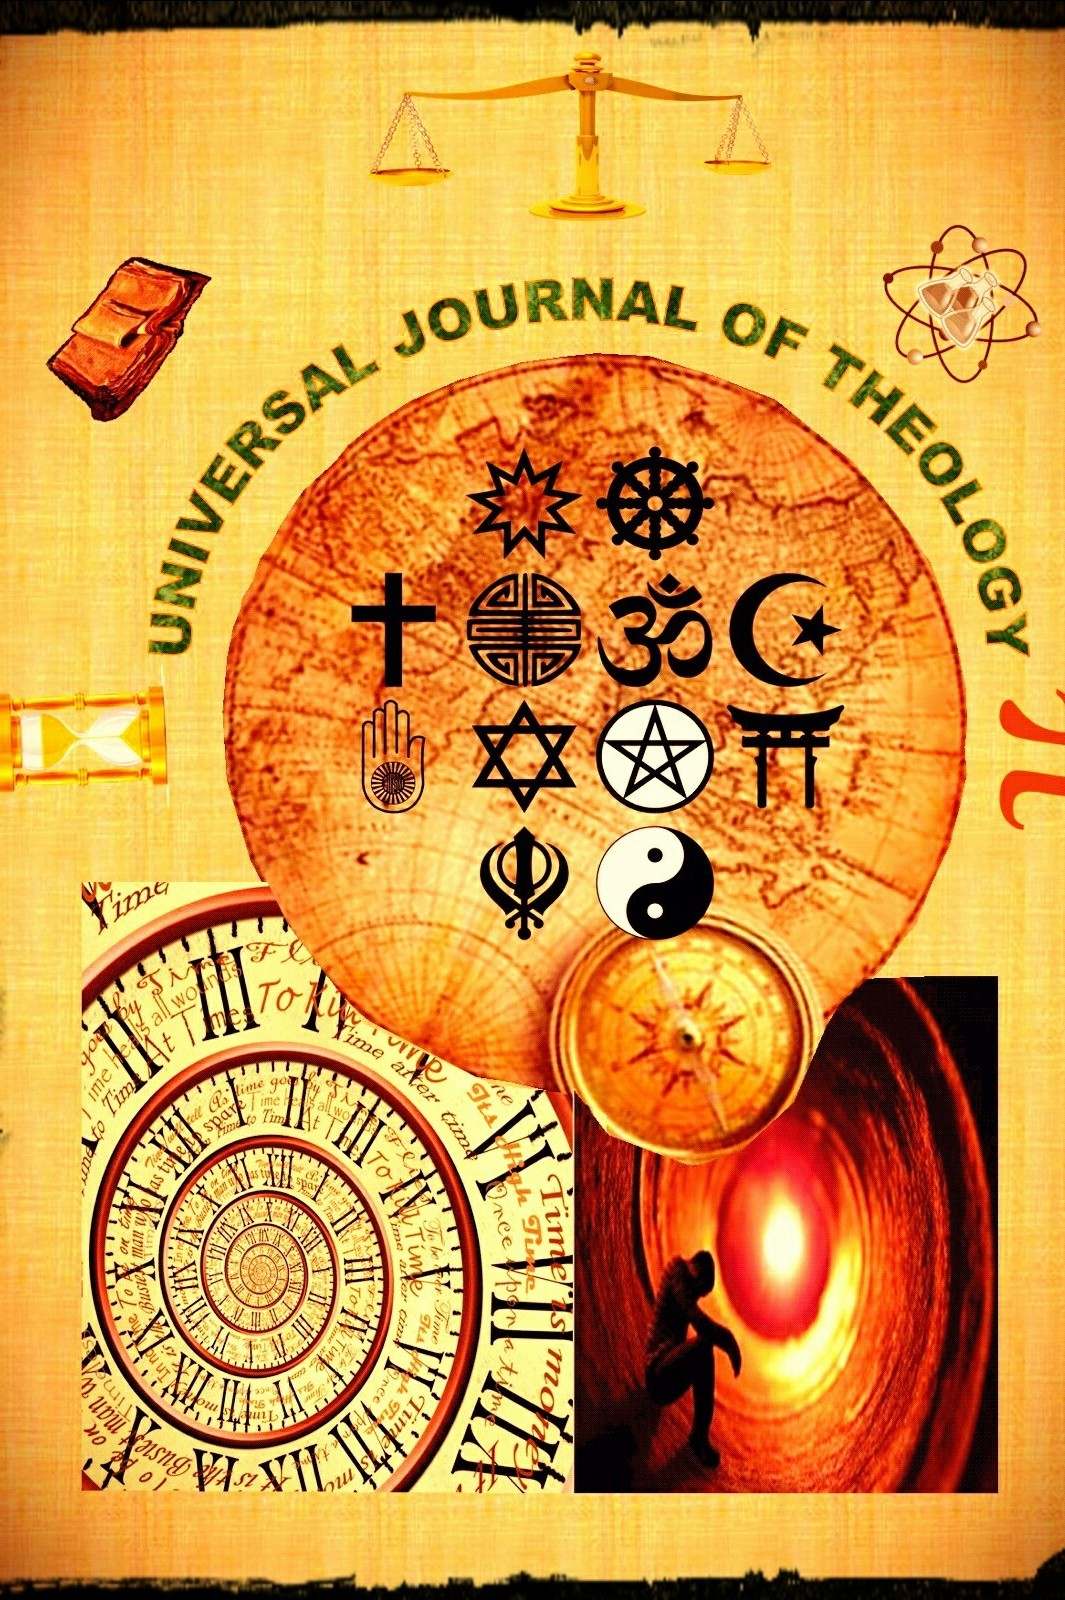 Universal Journal of Theology